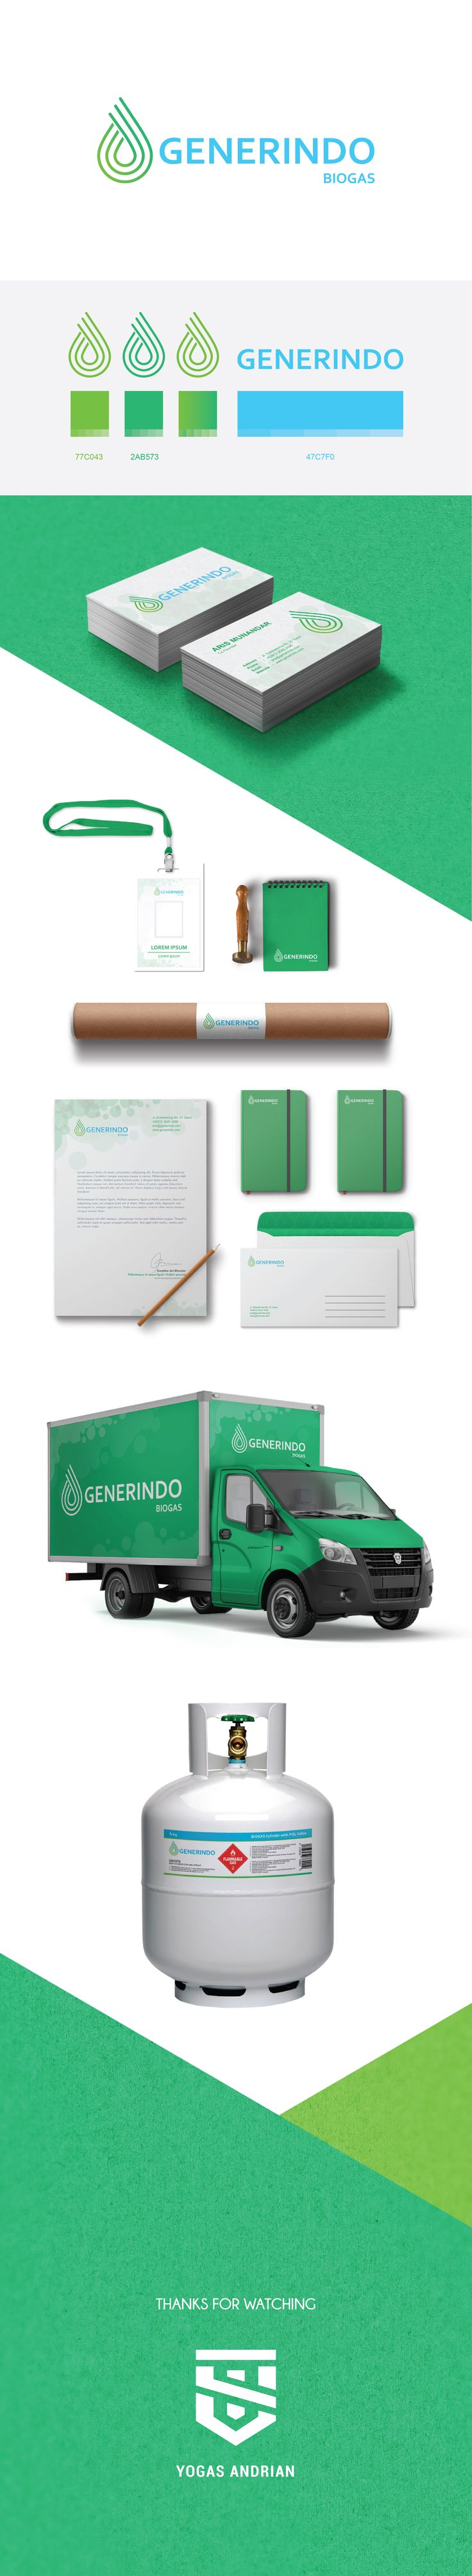 "Check out my @Behance project: ""Generindo Branding Identity"" https://www.behance.net/gallery/58631301/Generindo-Branding-Identity"